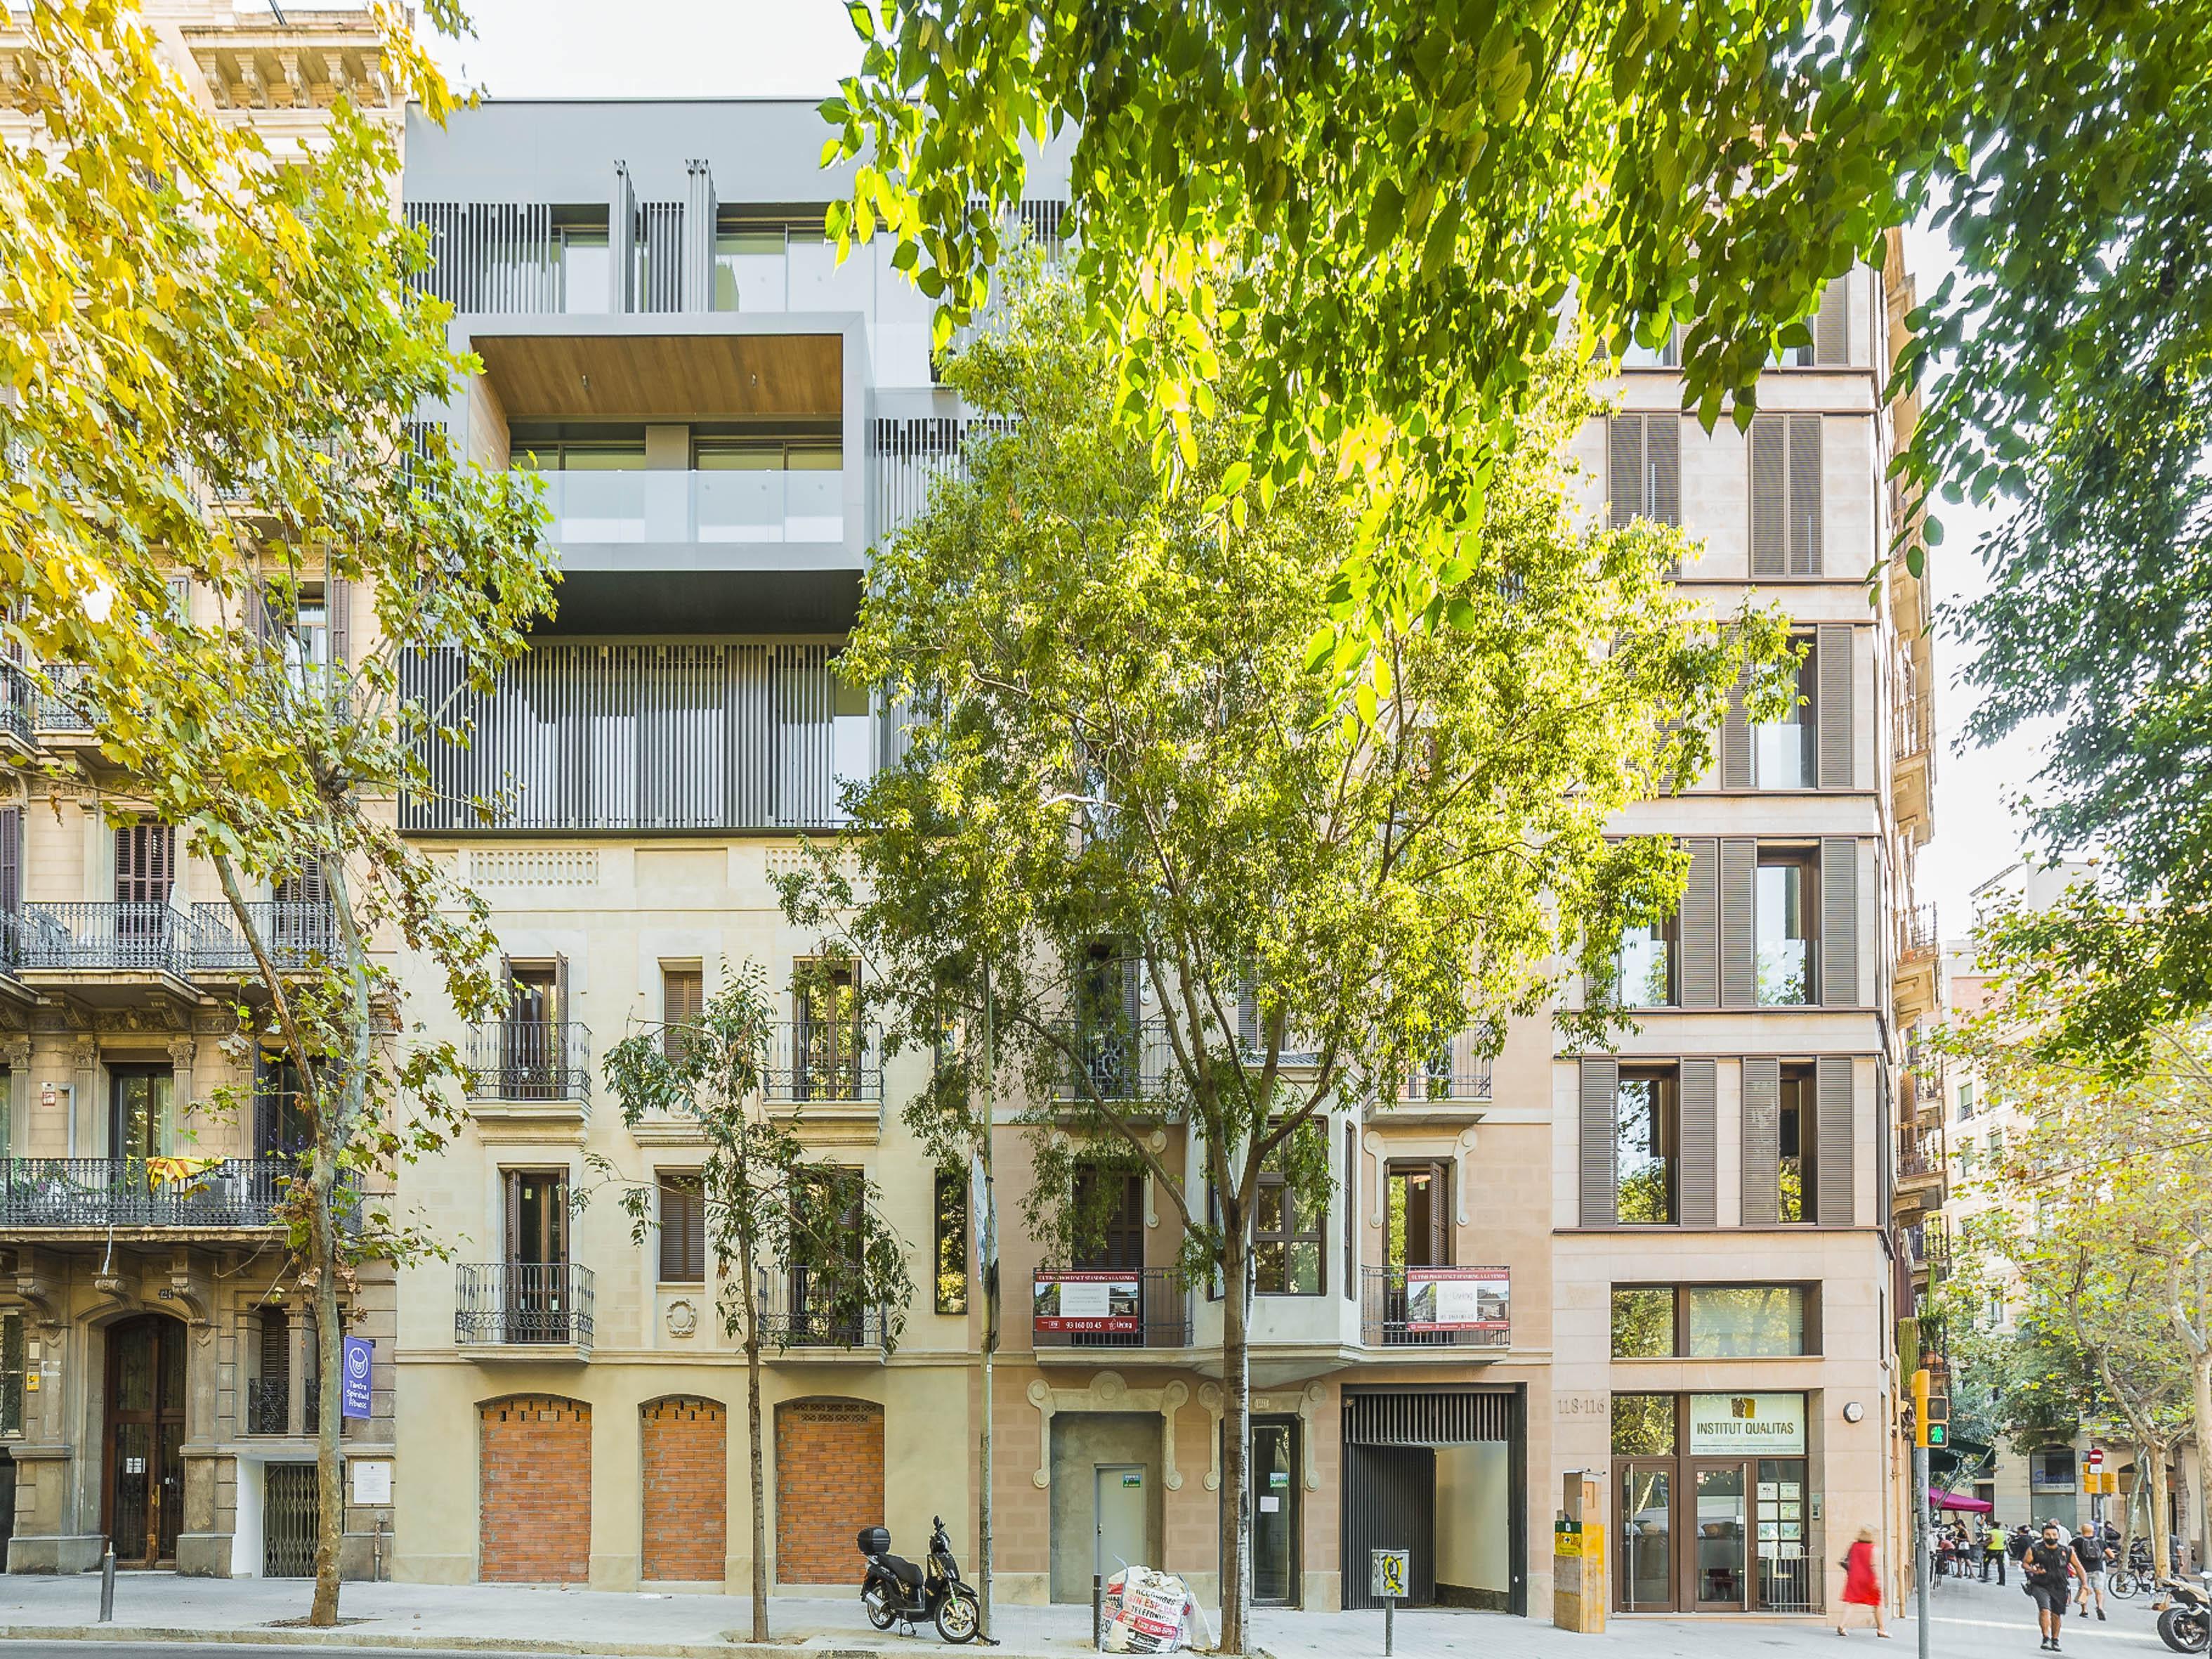 182456 Apartamento en venda en Eixample, Antiga Esquerre Eixample 30